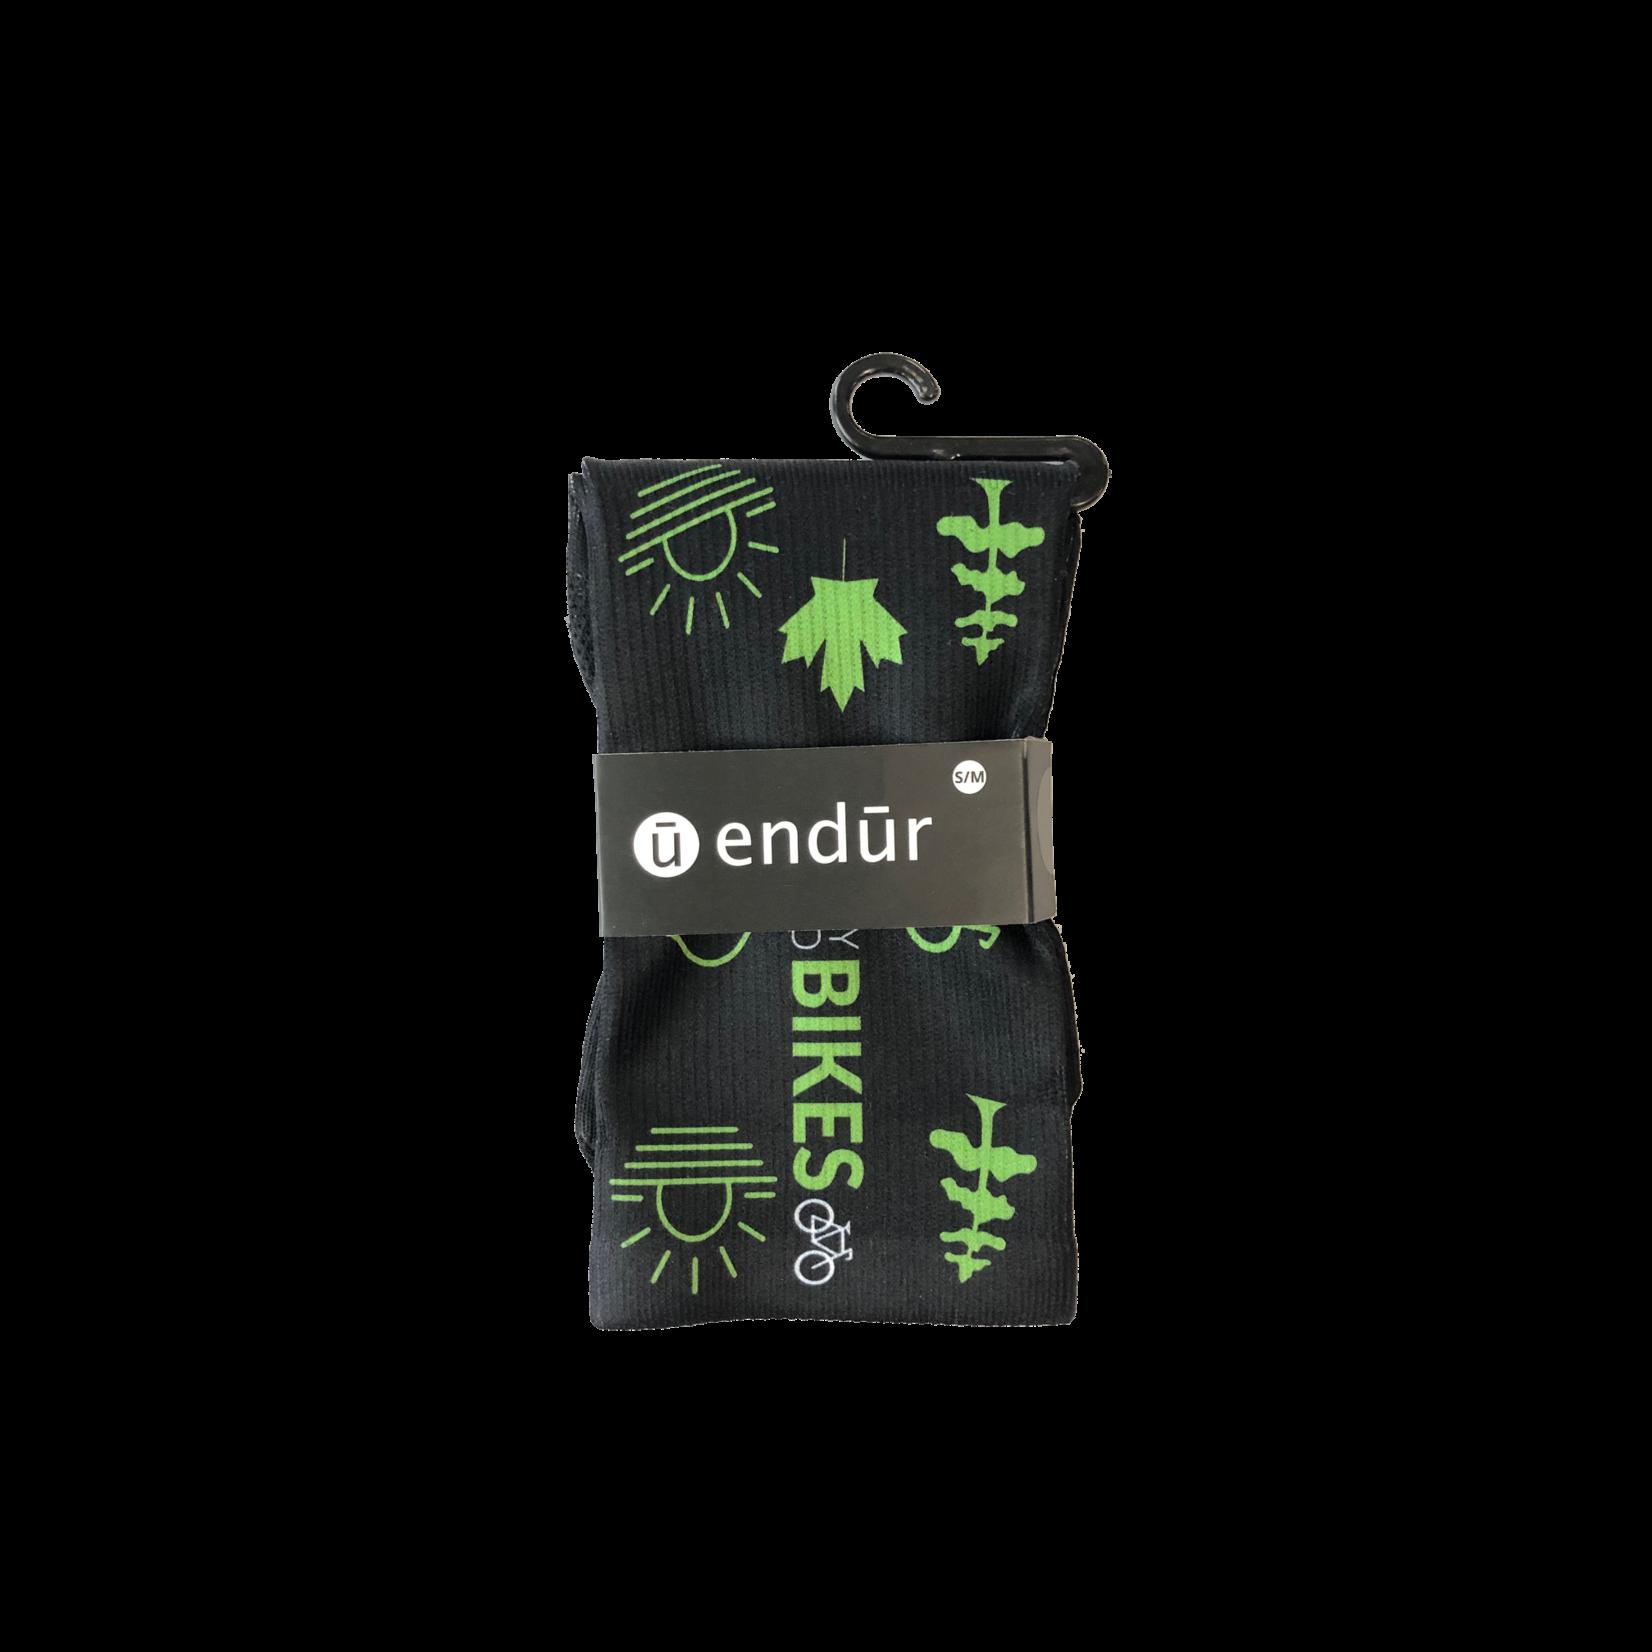 Endur Endur Parry Sound Bikes Icon Socks